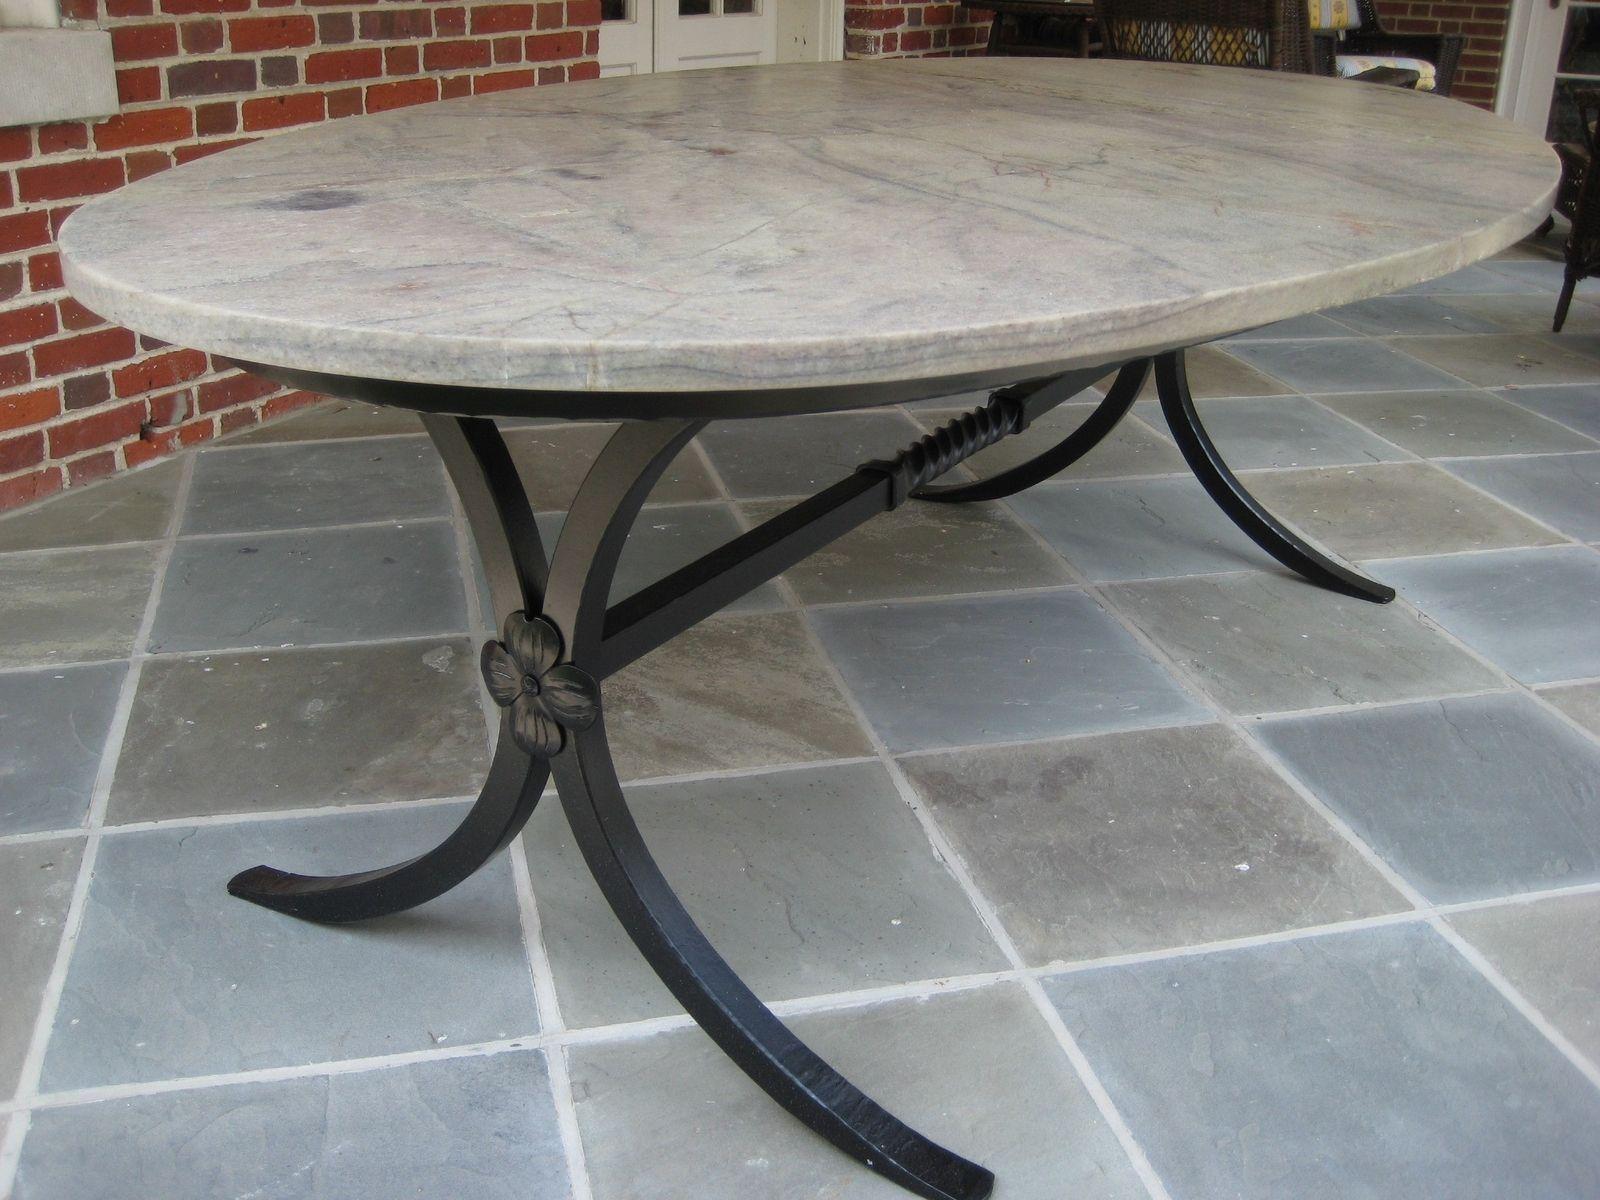 Iron Coffee Table Base Forged Table Cutare Google Proiecte De Rncercat Pinterest